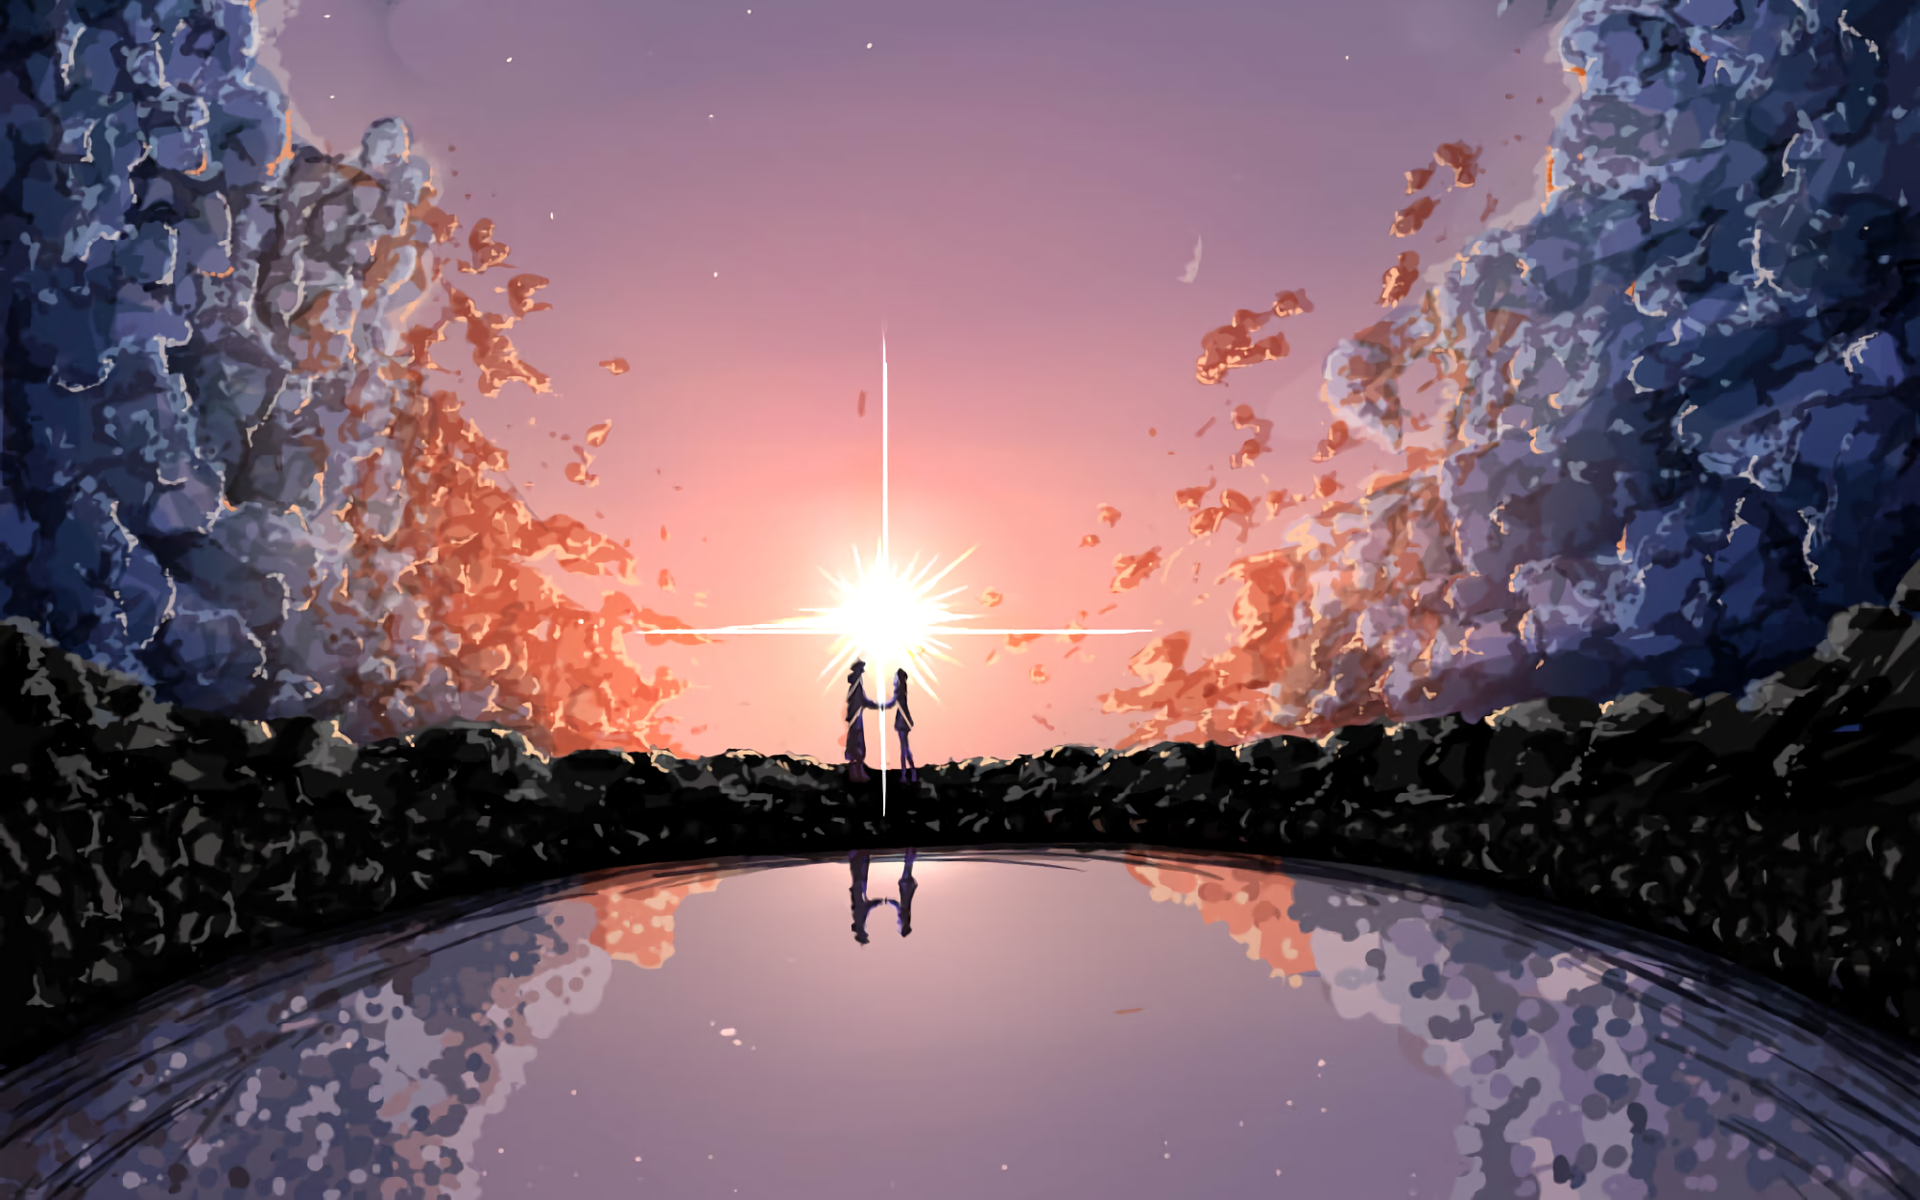 Hd wallpaper kimi no na wa - Kimi No Na Wa Mitsuha Miyamizu Hd Wallpaper Background Id 742573